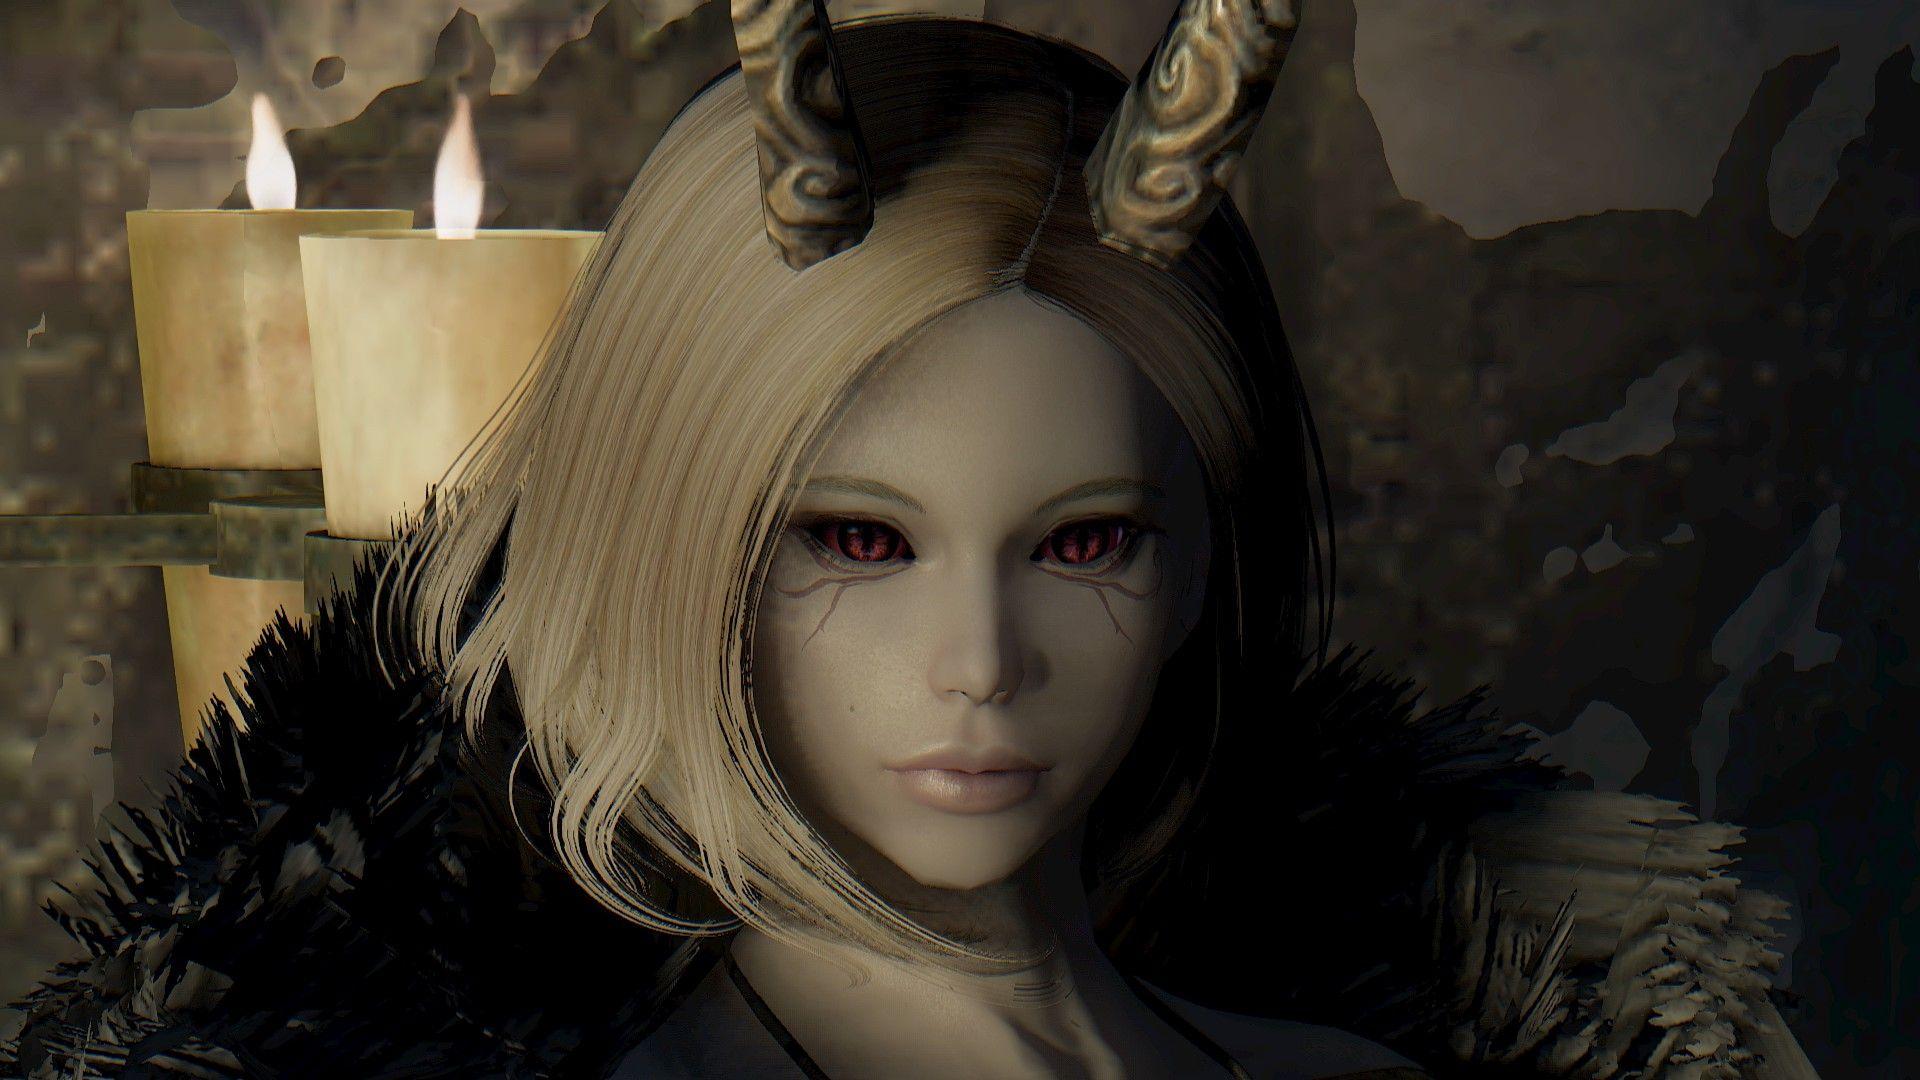 Skyrim nexus mods and community